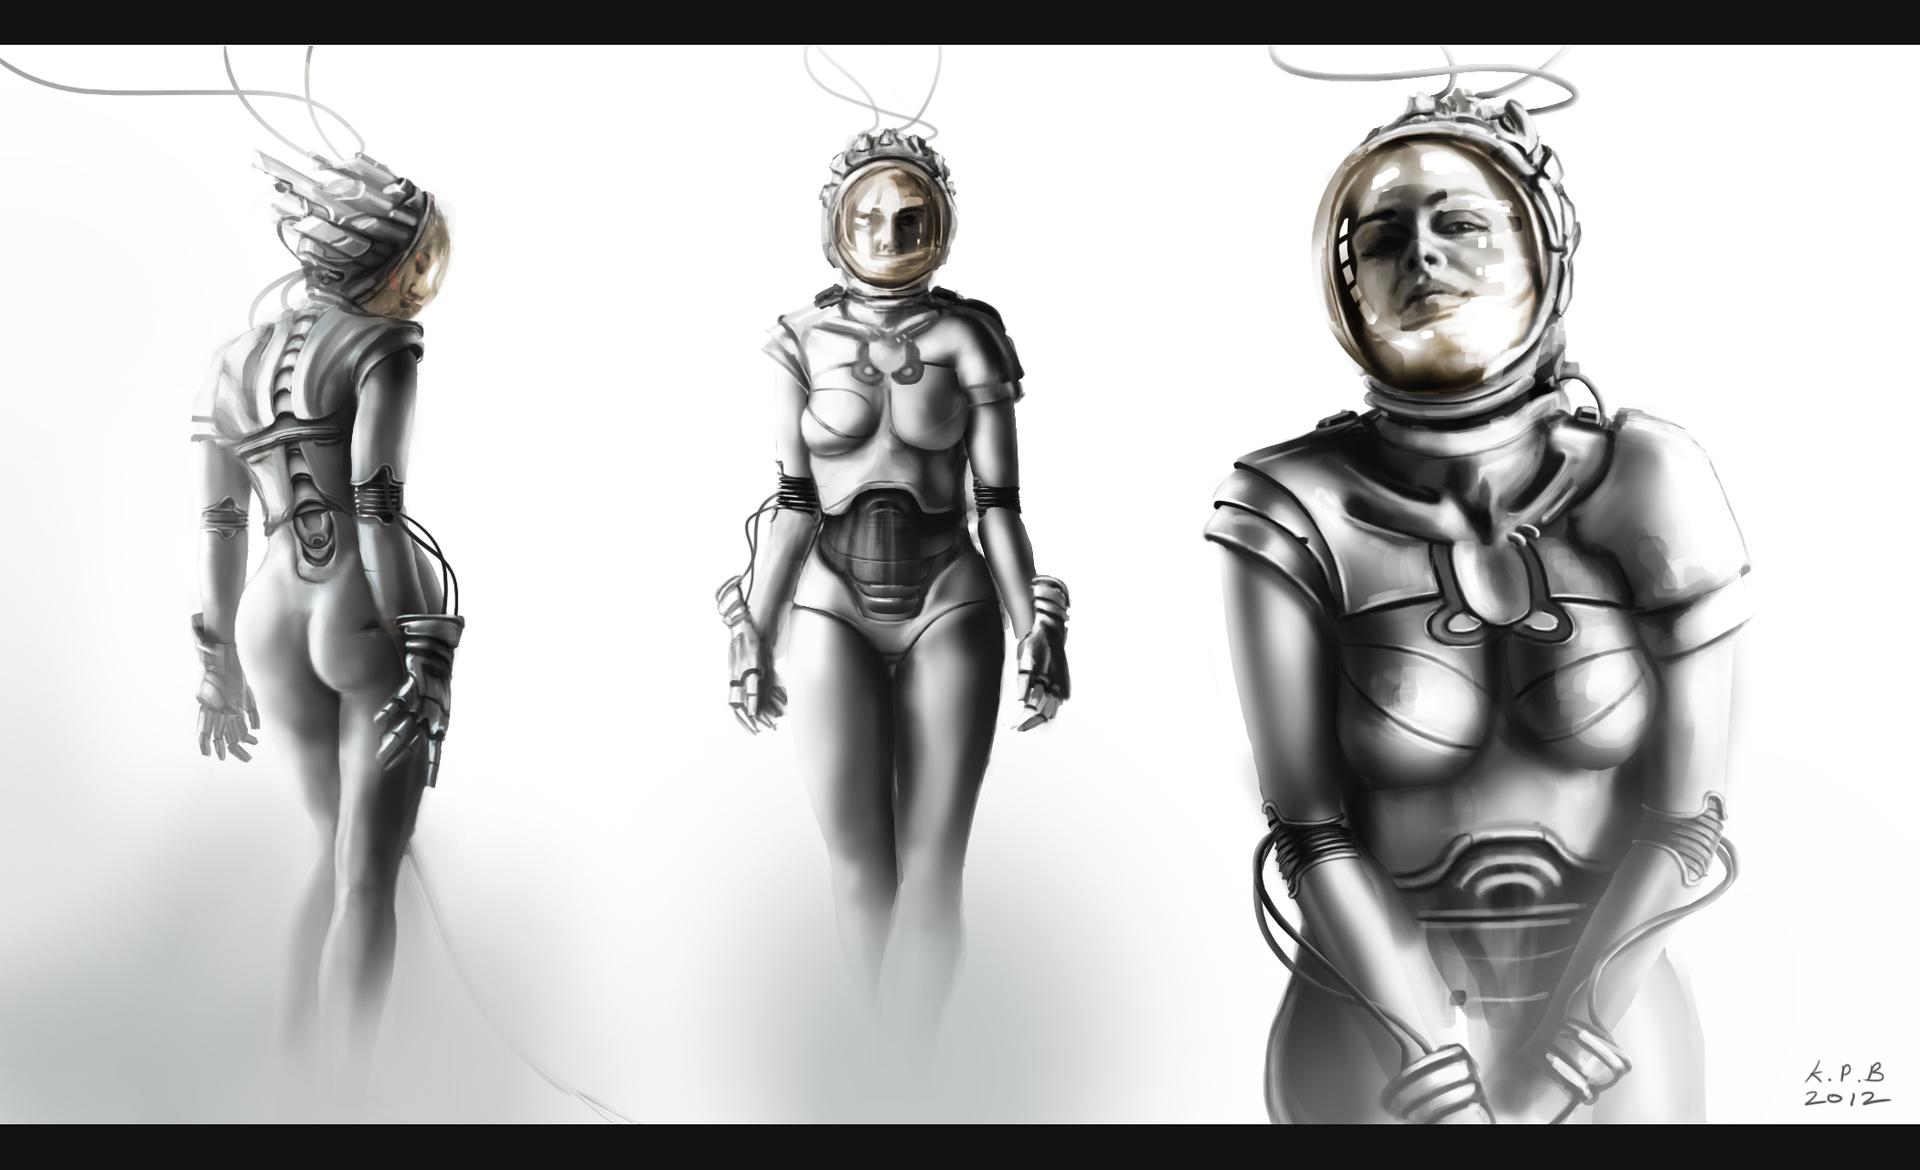 Androidwoman concept v006a